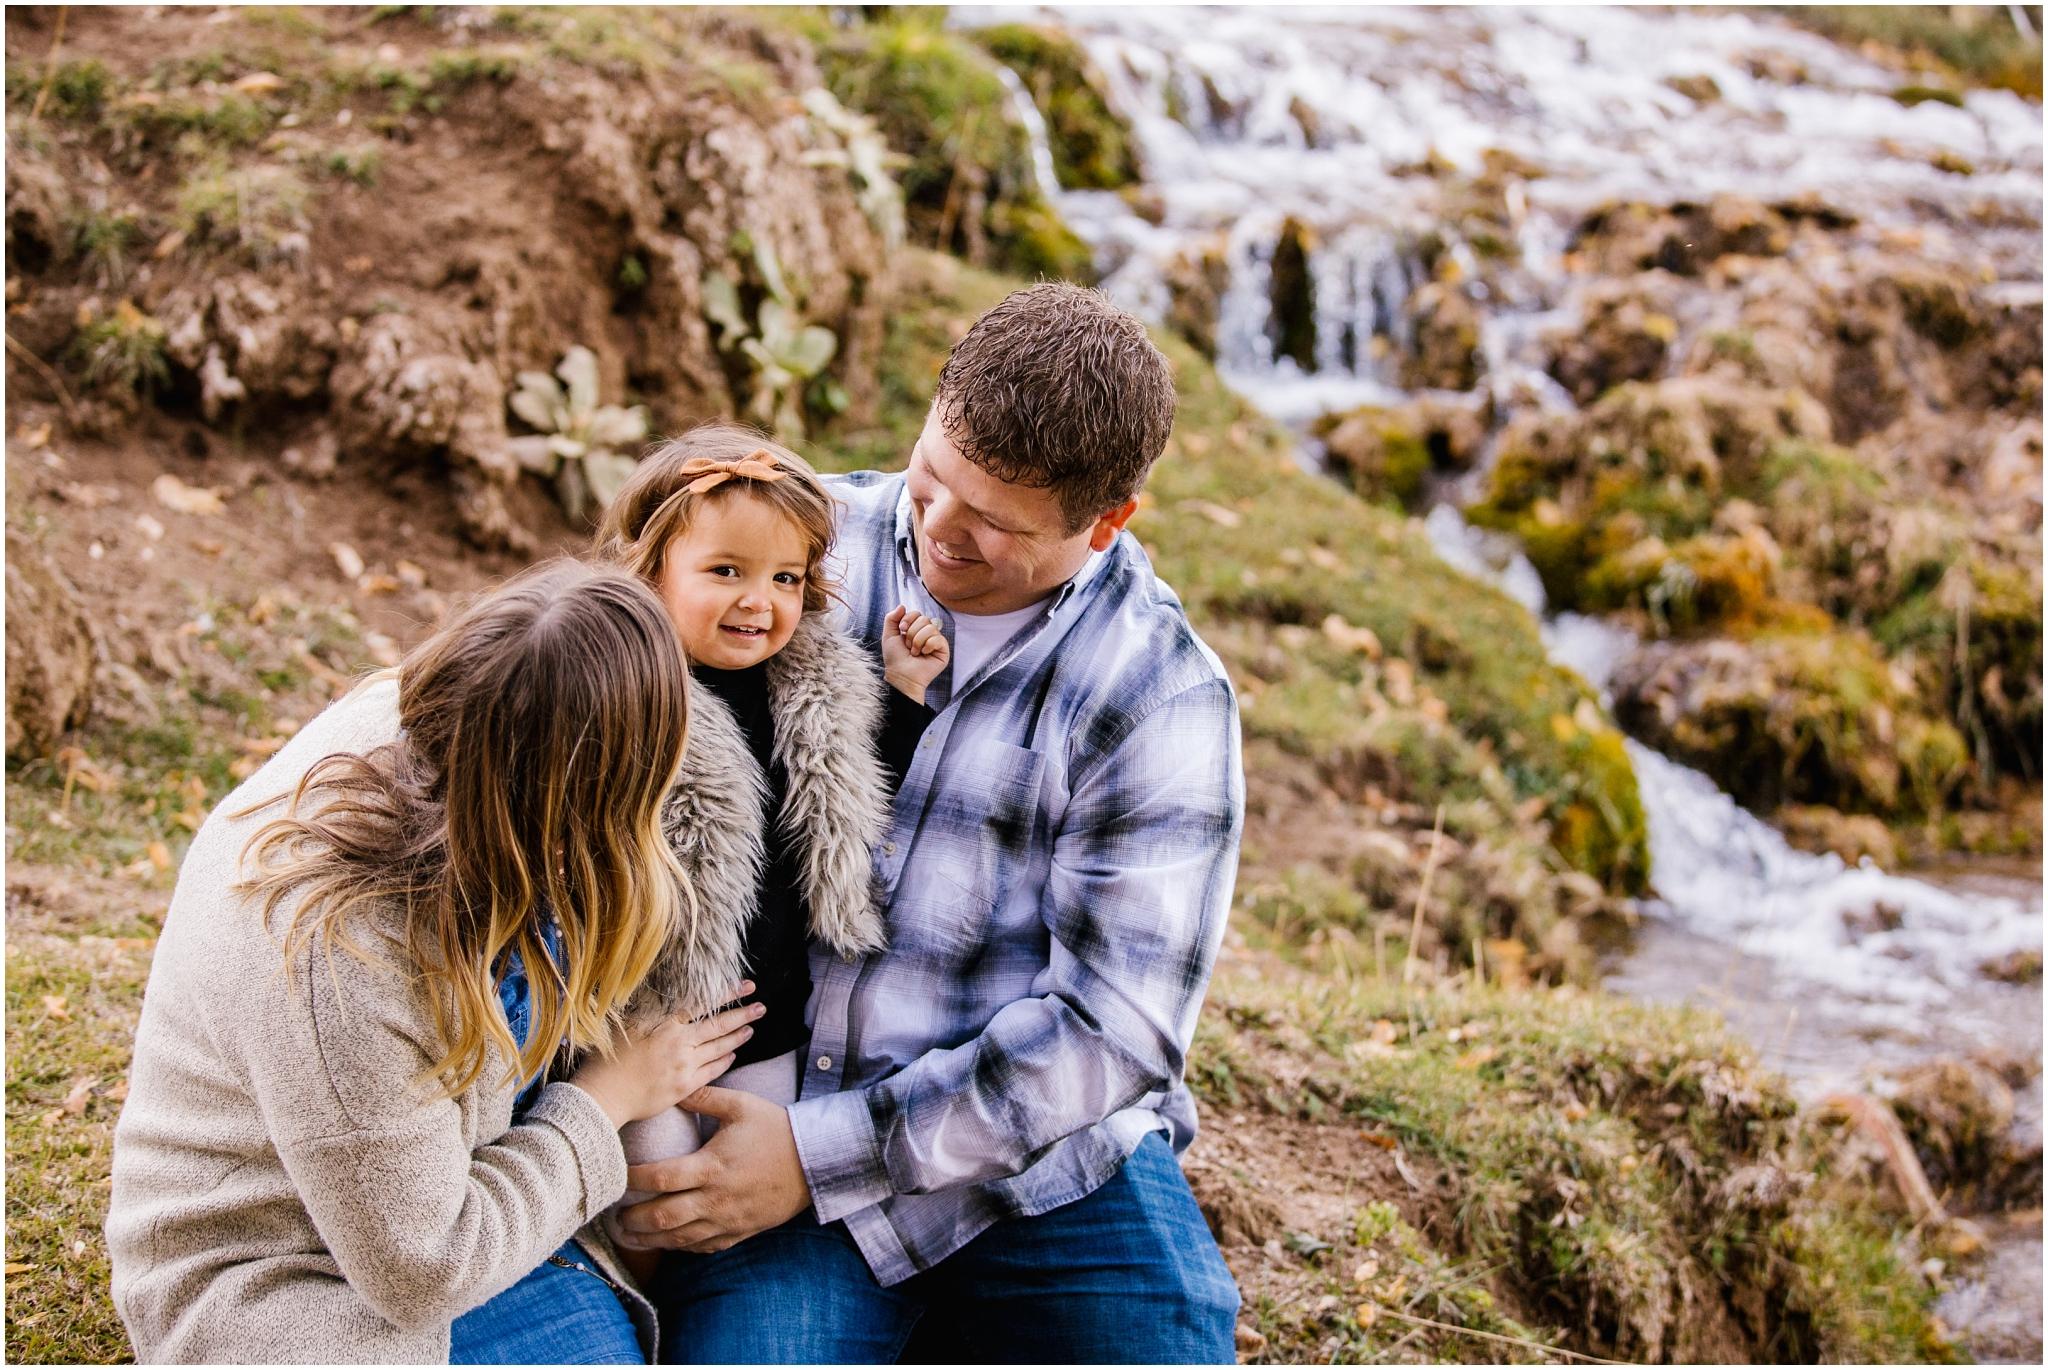 Frandsen-18_Lizzie-B-Imagery-Utah-Family-Photographer-Utah-County-Central-Utah-Park-City-Salt-Lake-City.jpg